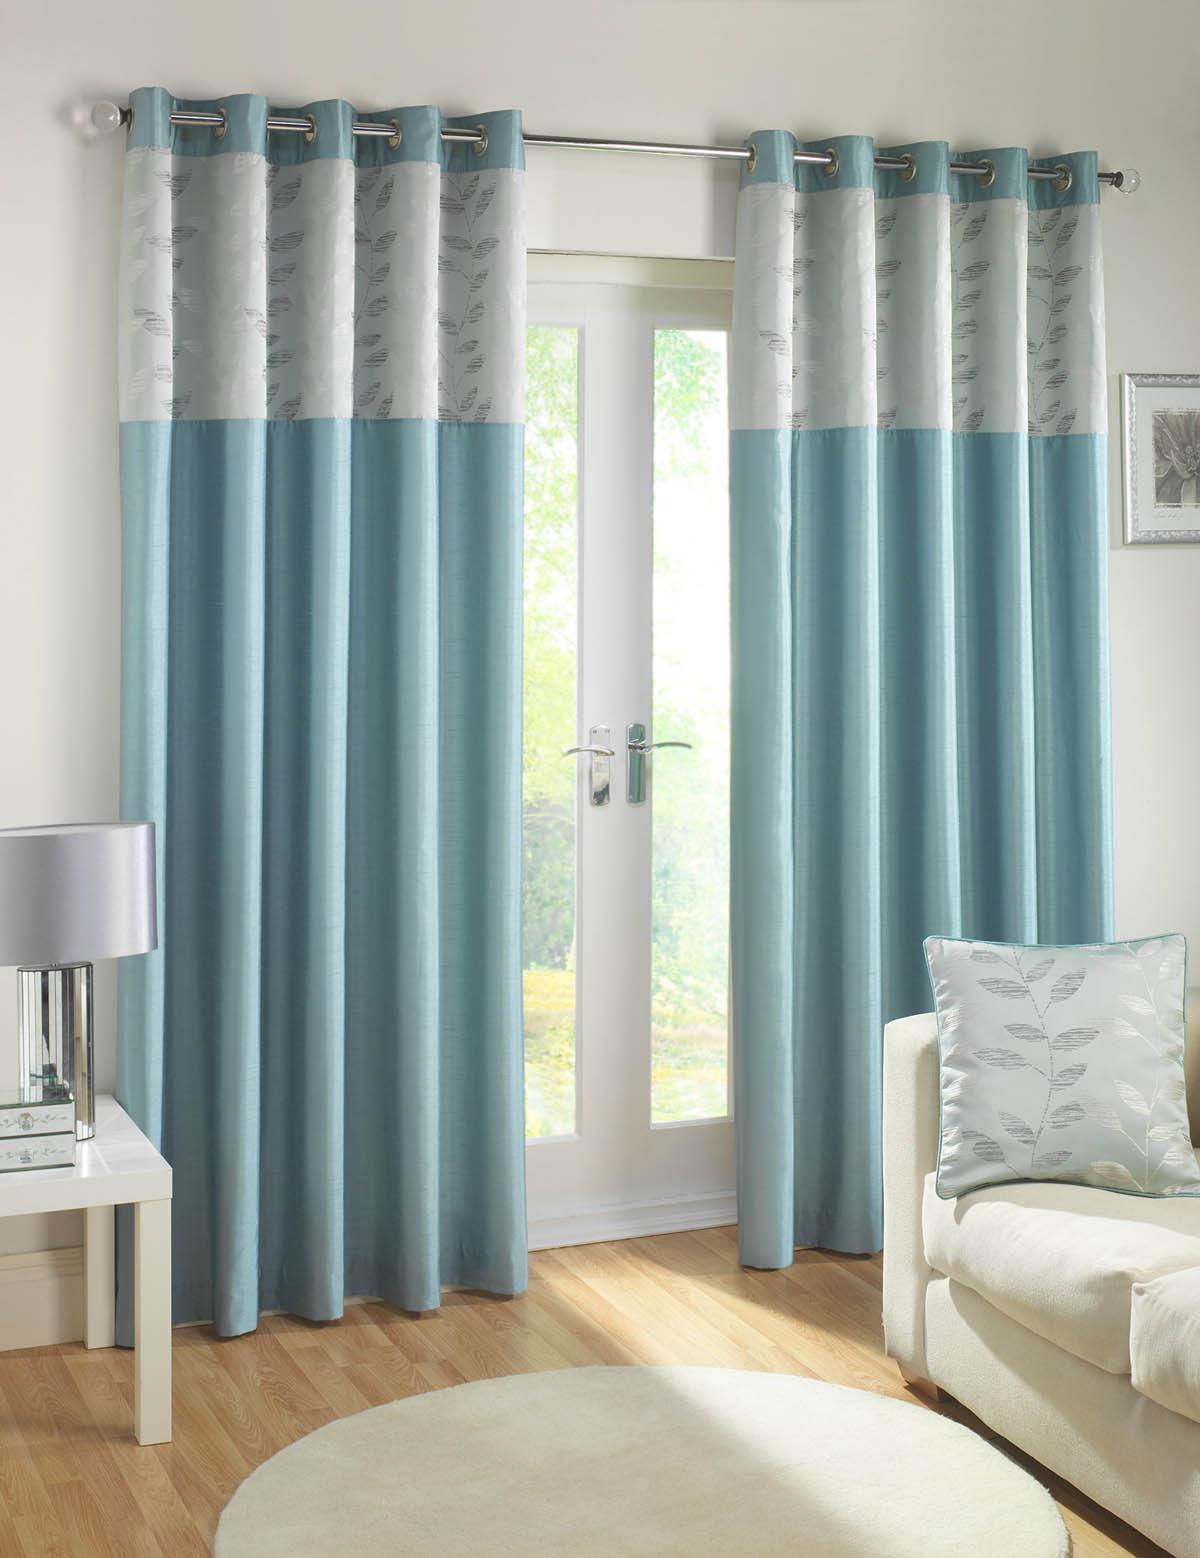 Amazing Duck Egg Blue Curtains - Duck Egg Blue Curtains for Soft Pastel duck egg blue curtains